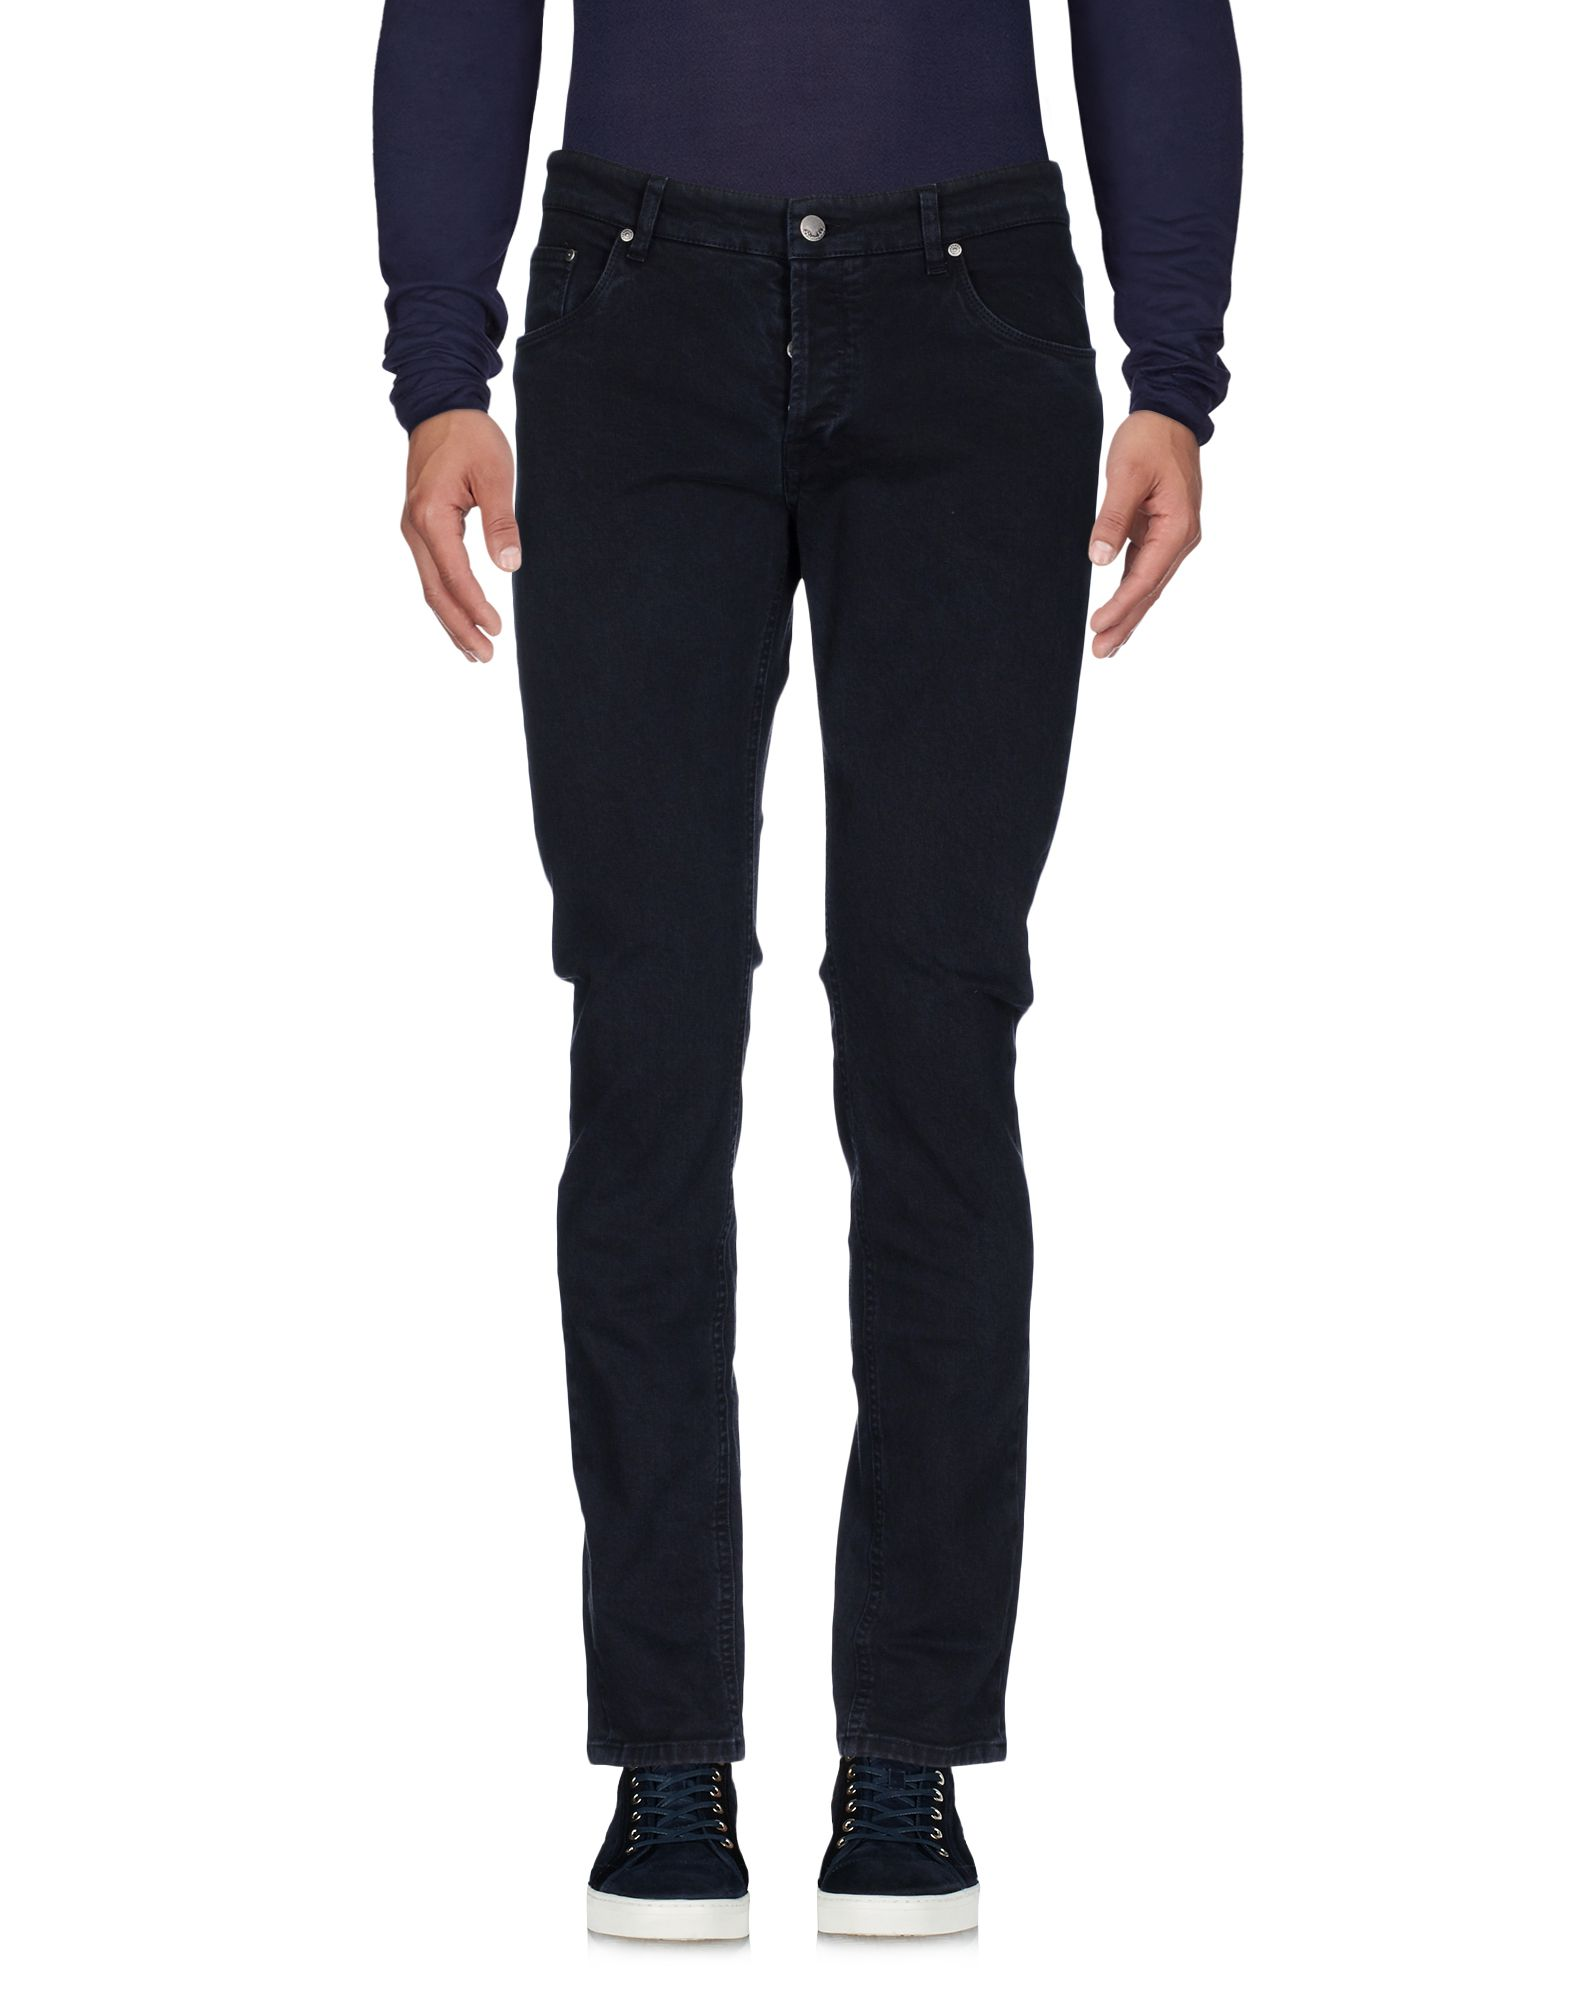 DANIELE ALESSANDRINI HOMME Джинсовые брюки daniele alessandrini сорочка daniele alessandrini c1410b762c3205 40 цветной